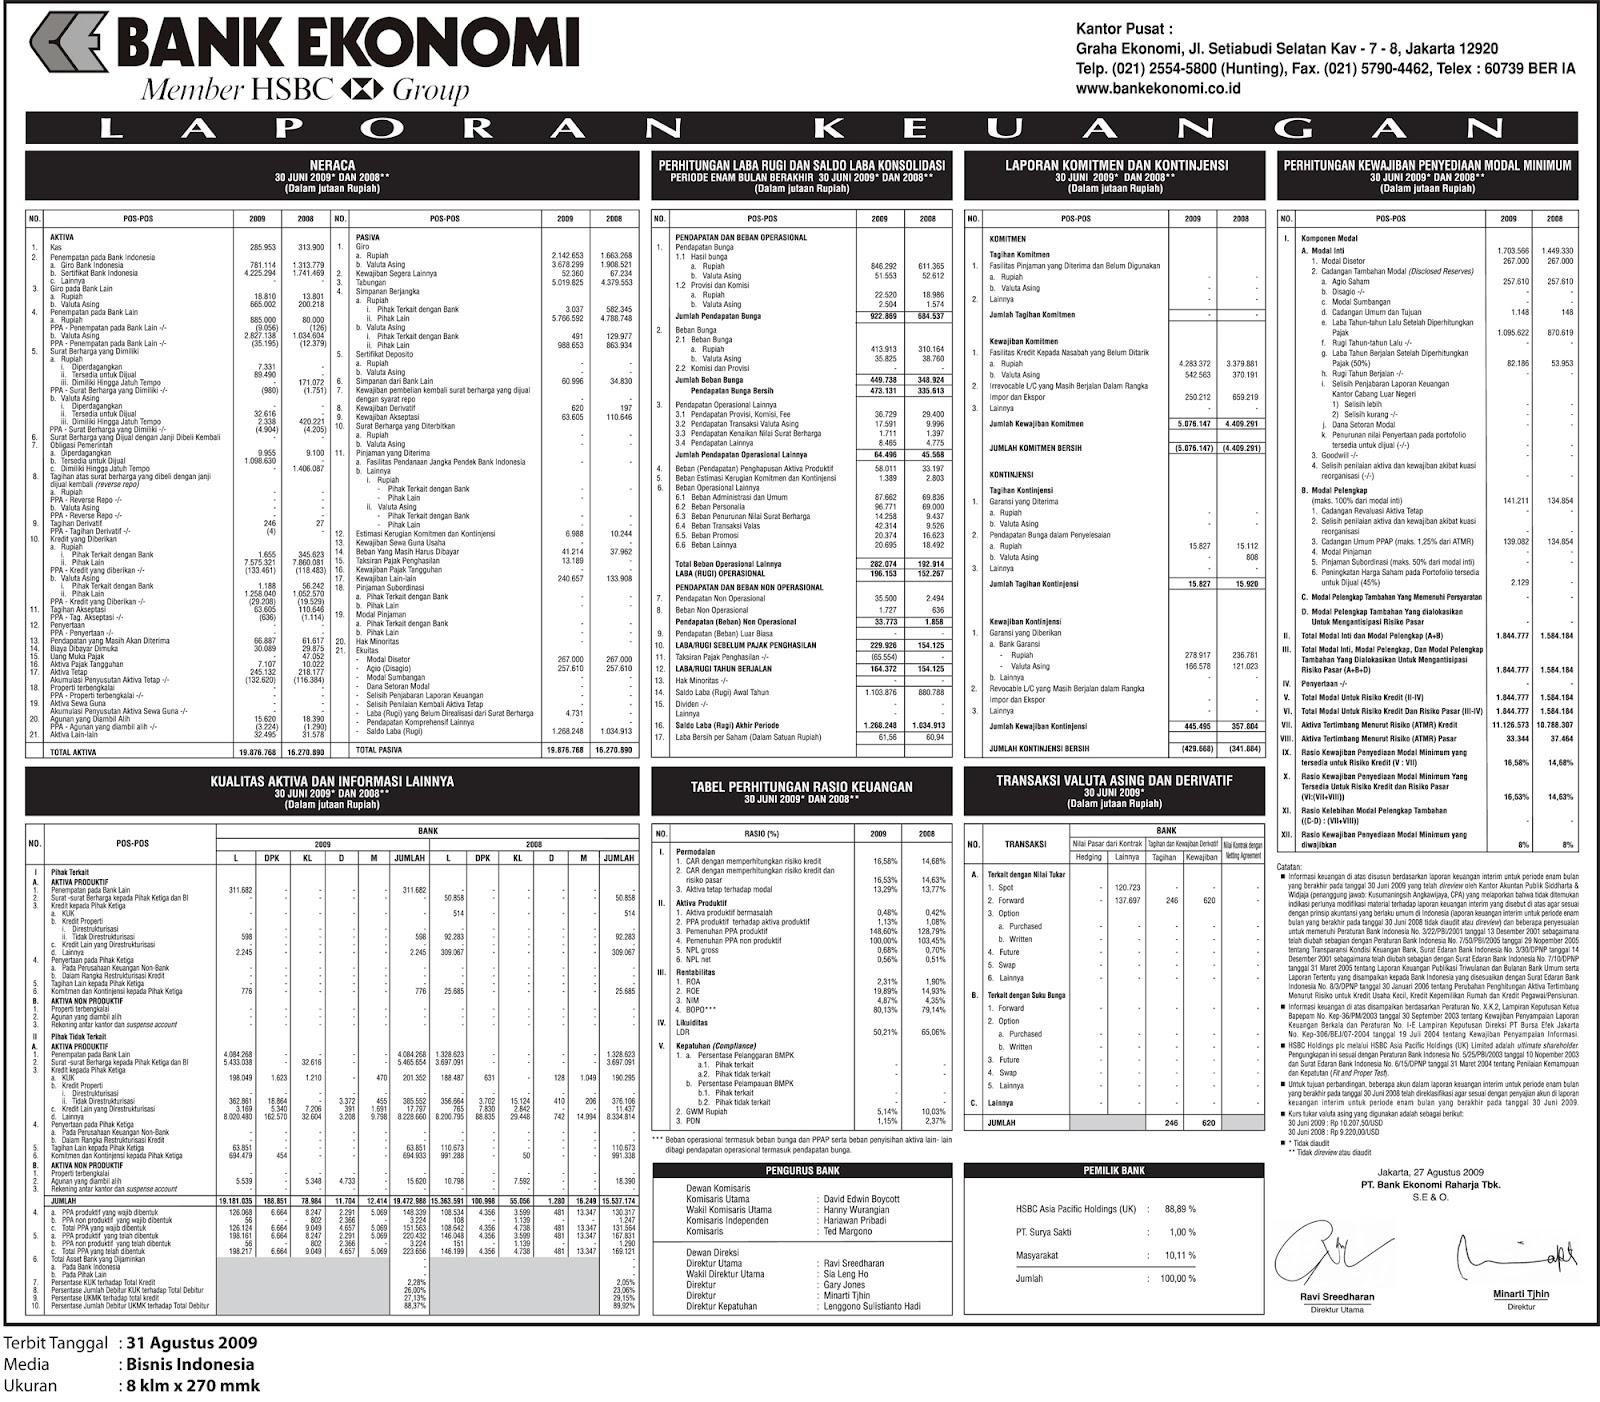 Contoh Laporan Pkl Ekonomi Syariah Contoh Judul Karya Tulis Ilmiah Dalam Bentuk Makalah Contoh Laporan Keuangan Bank Mbegedut Blog